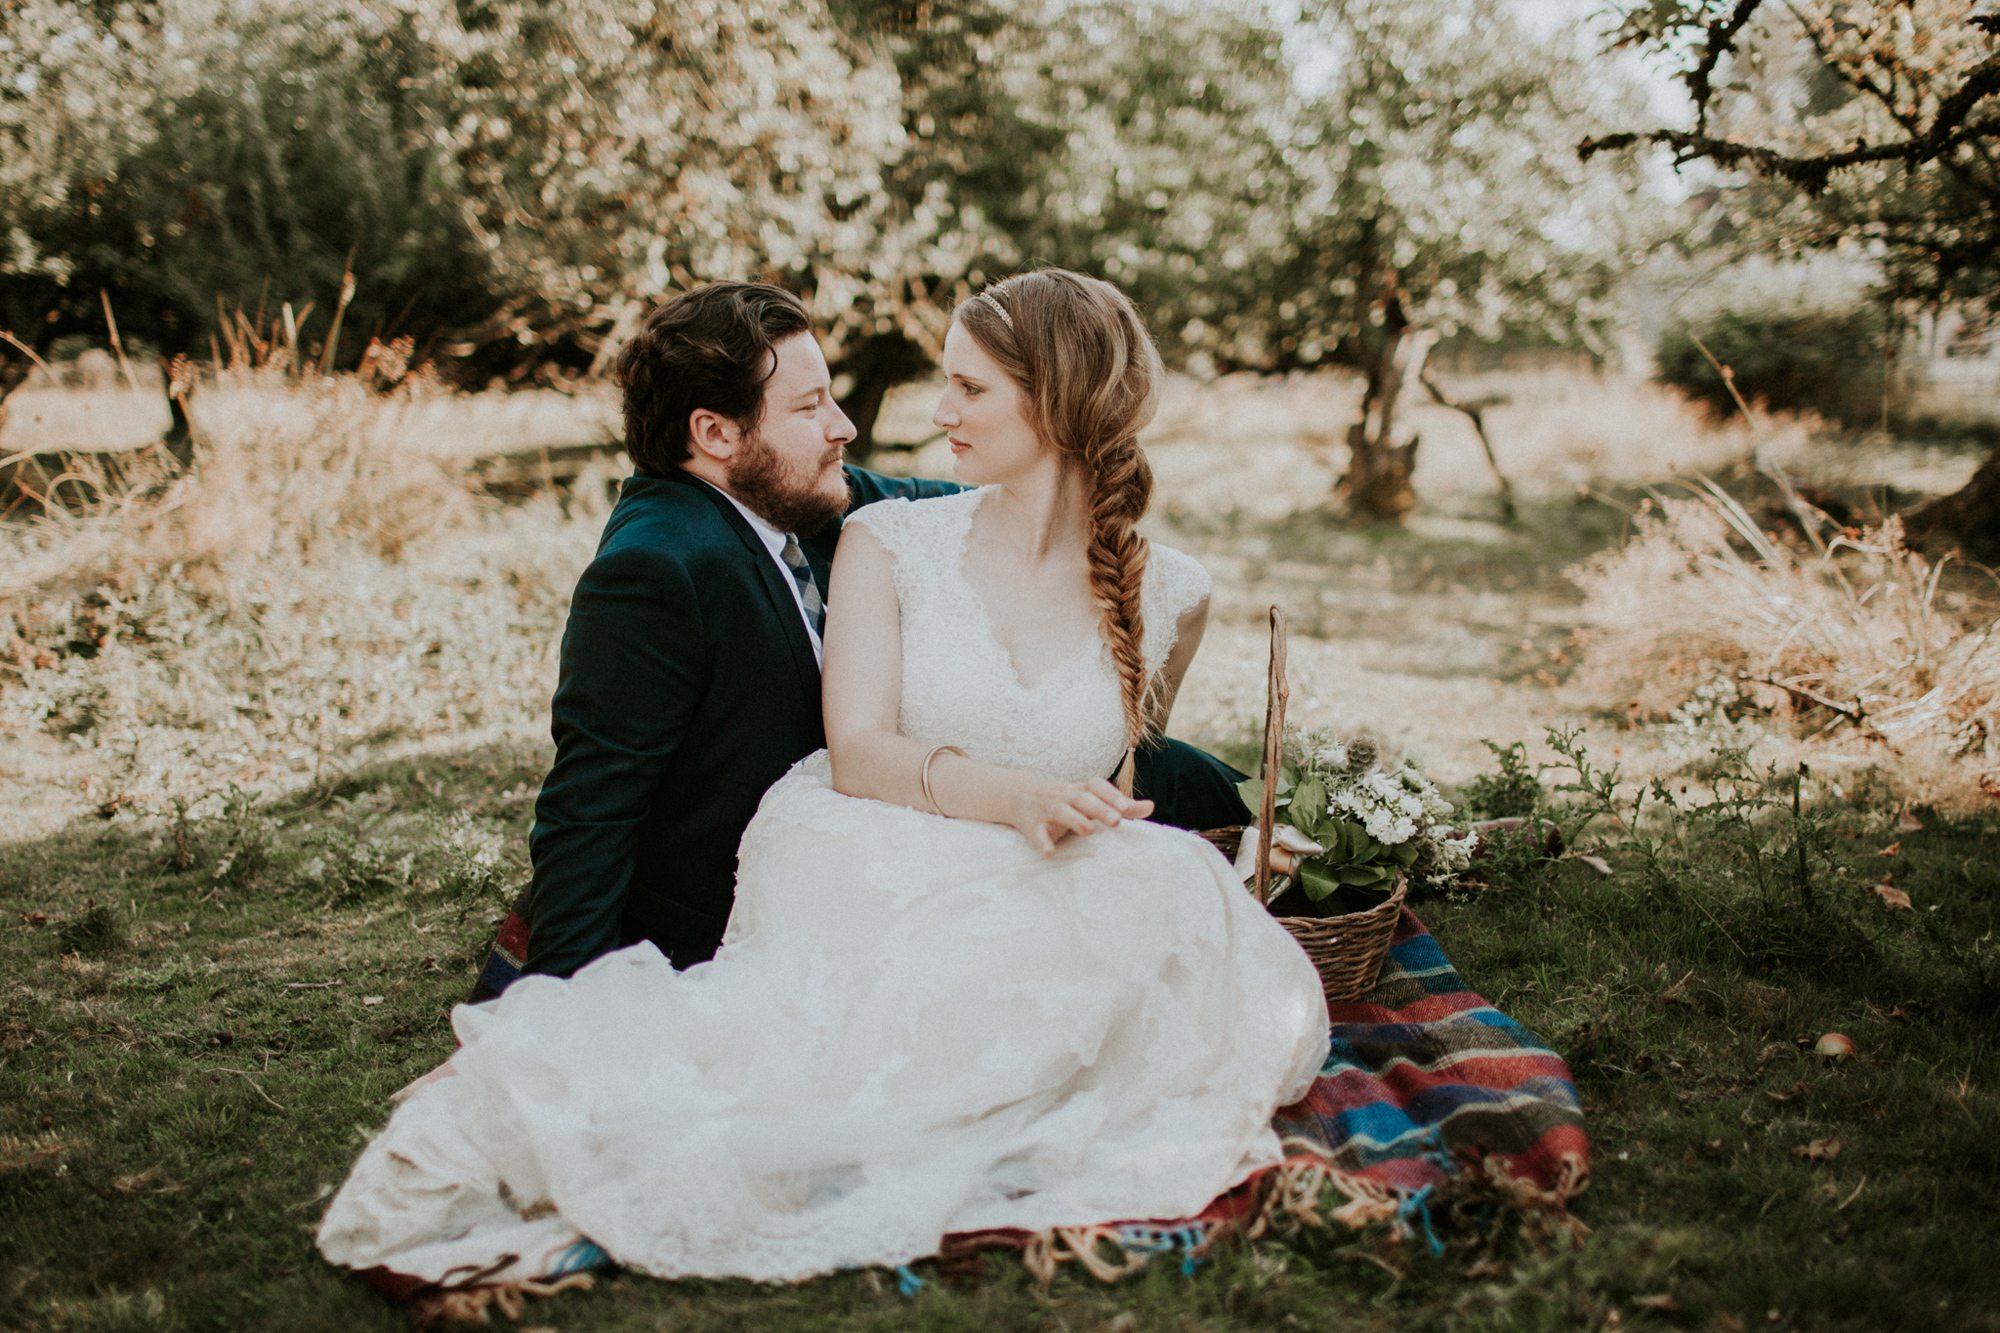 875-abbotsford-wedding-photographer